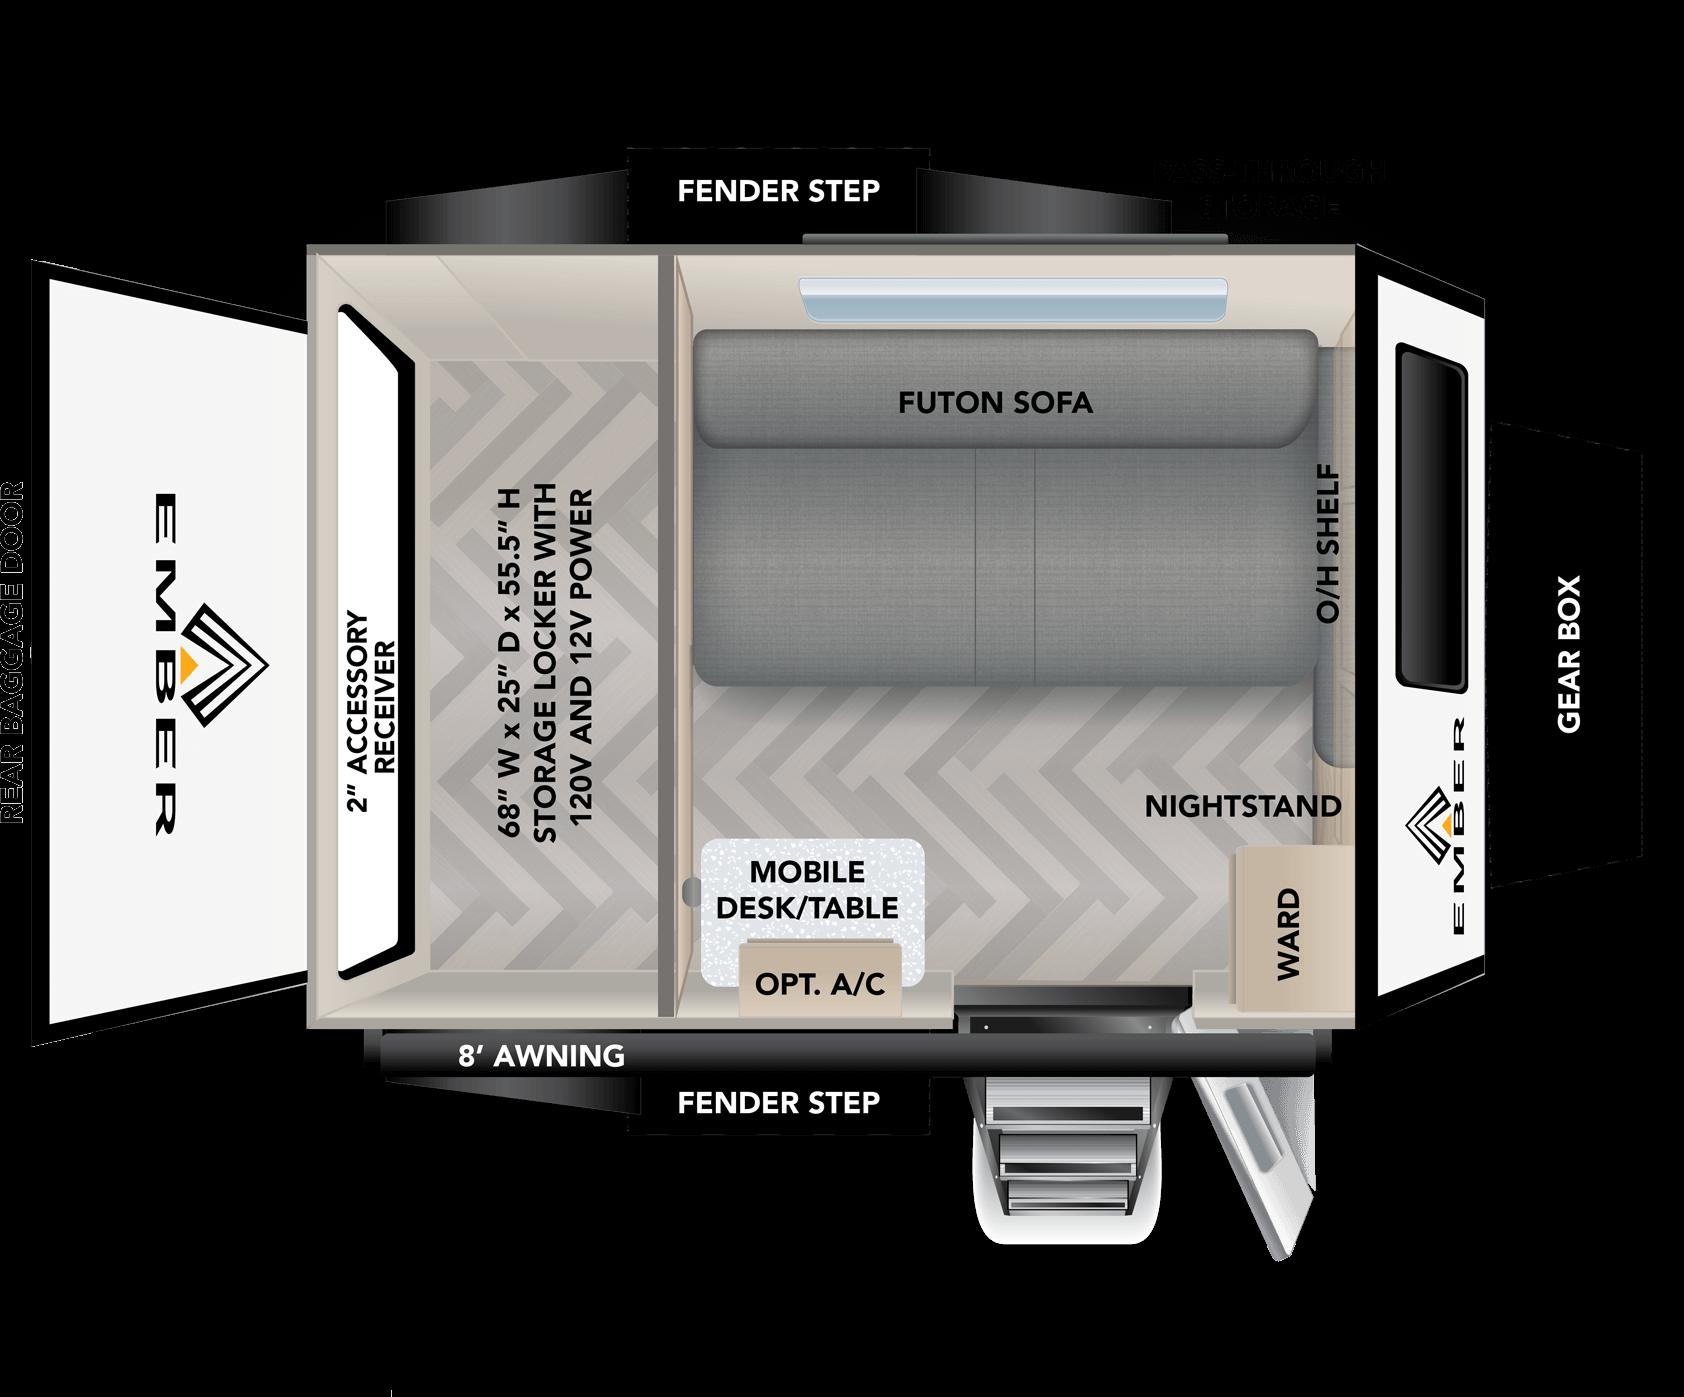 Floorplan image for ROL